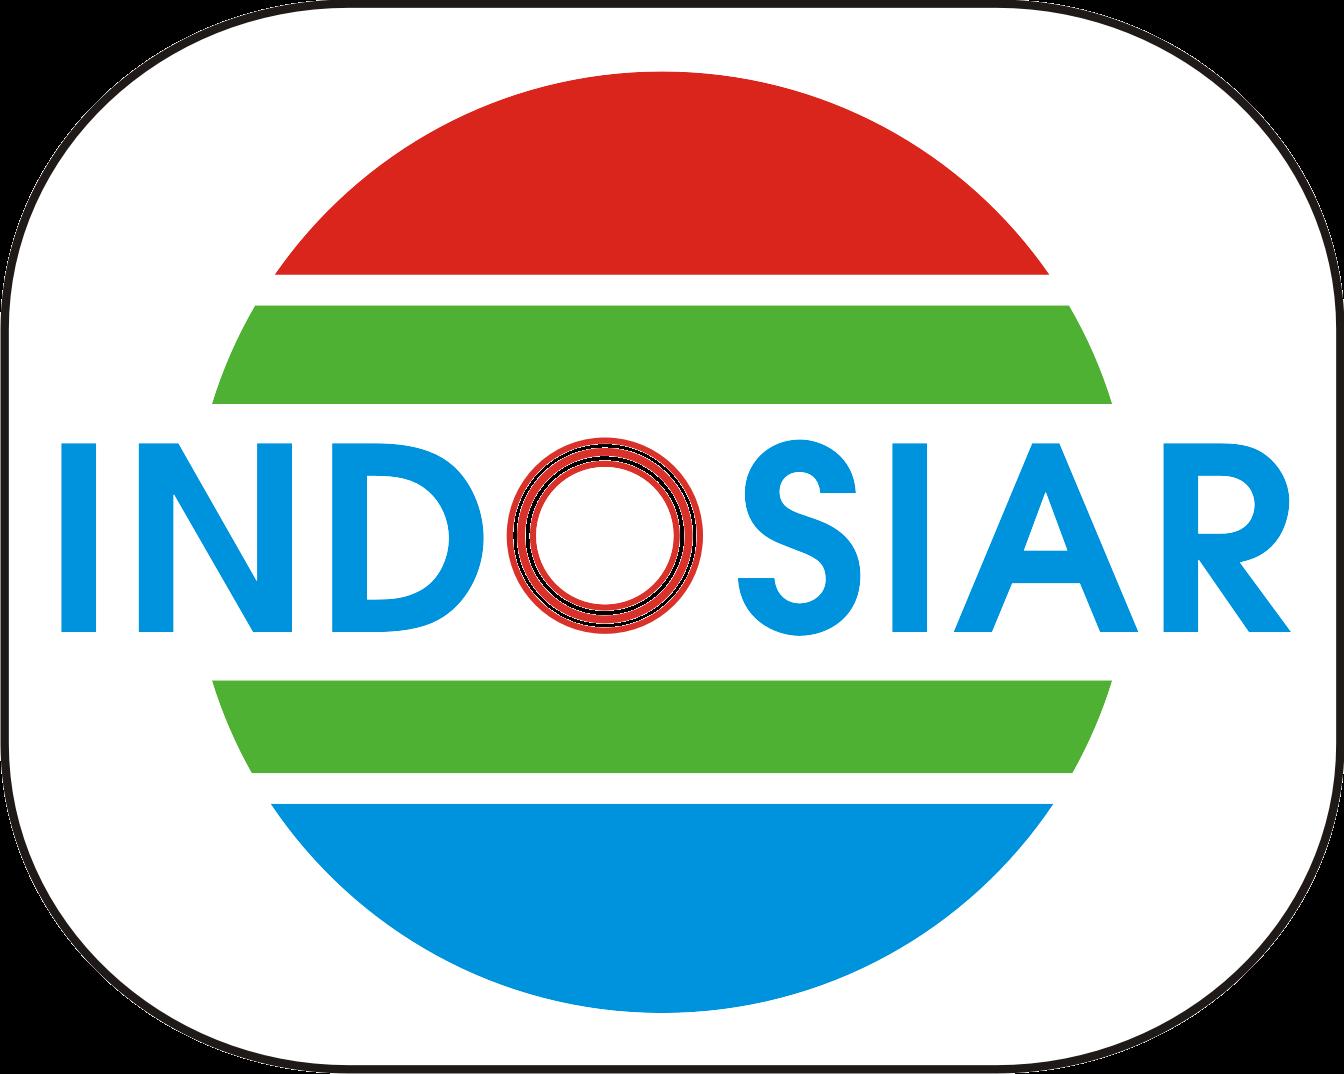 Info Lowongan Kerja Terbaru Ntb 2013 Lowongan Kerja Indosat Agustus 2016 Terbaru Info Cpns Image Info Lowongan Kerja Terbaru 2013 Berita Kumpulan Terpopuler